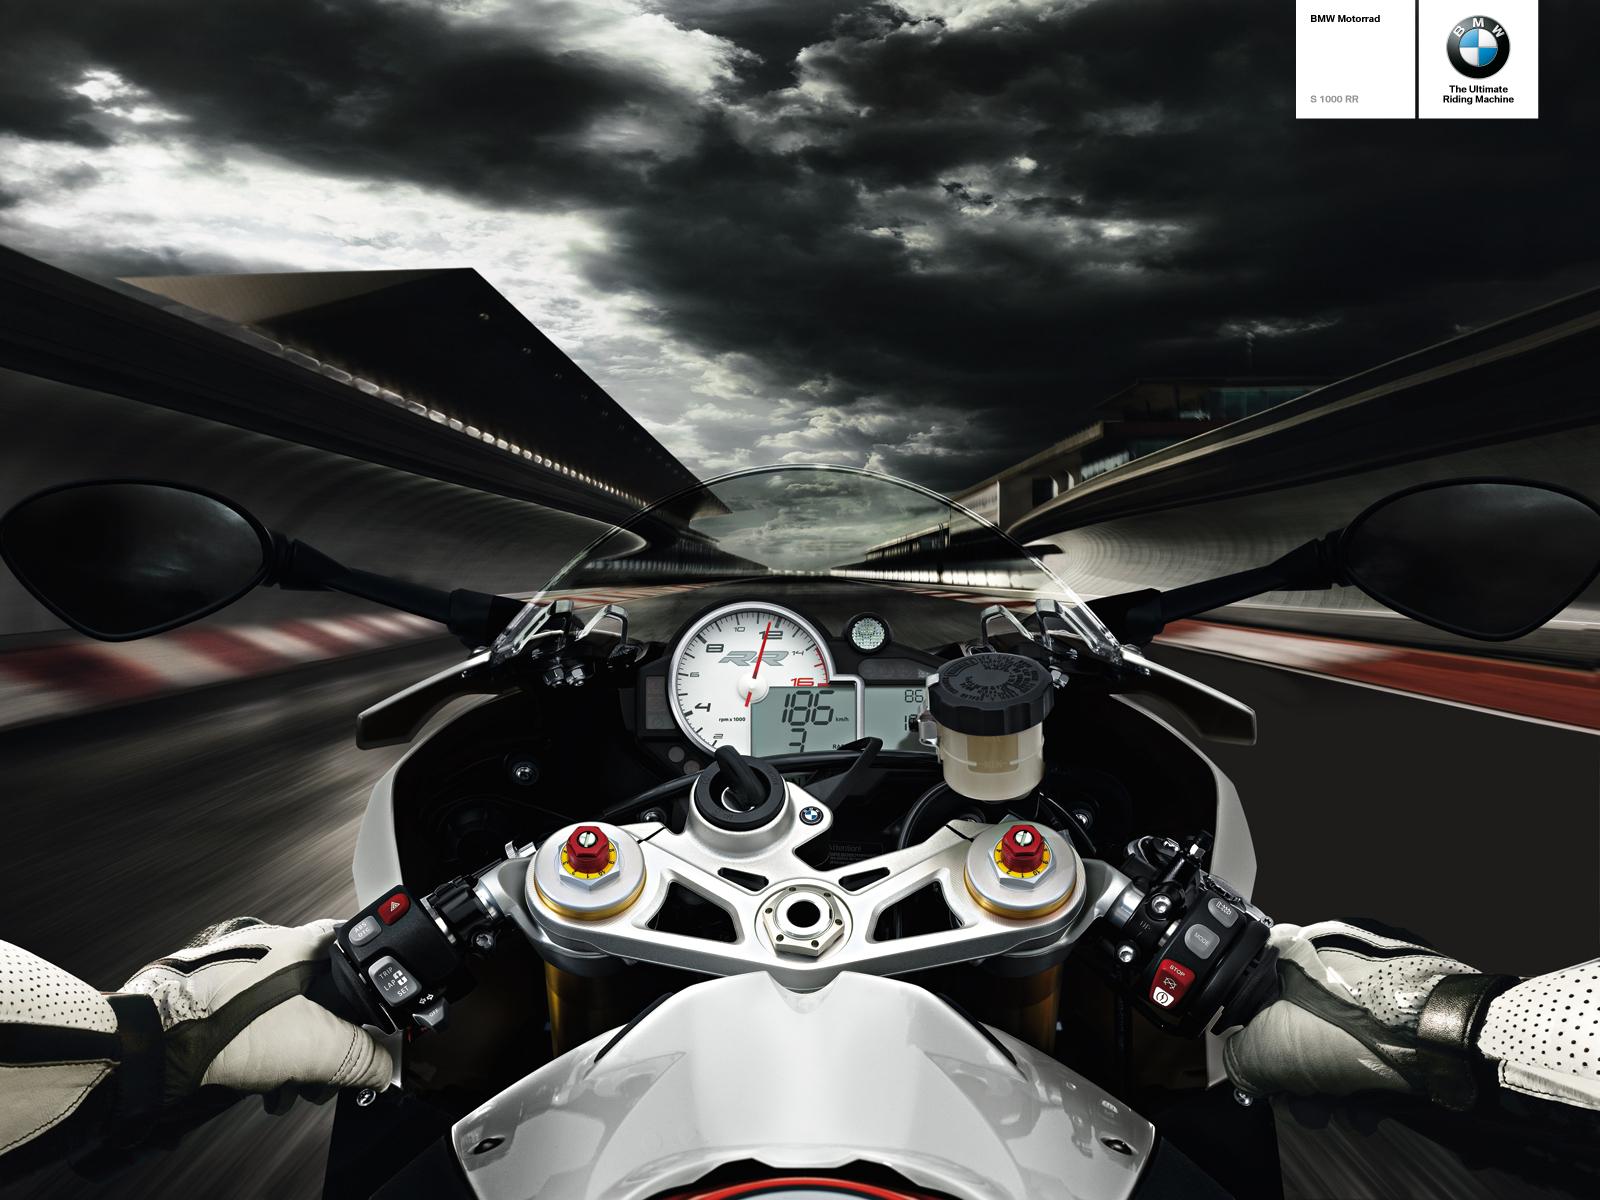 Bmw Electronic Clinic Wallpaper Motorrad